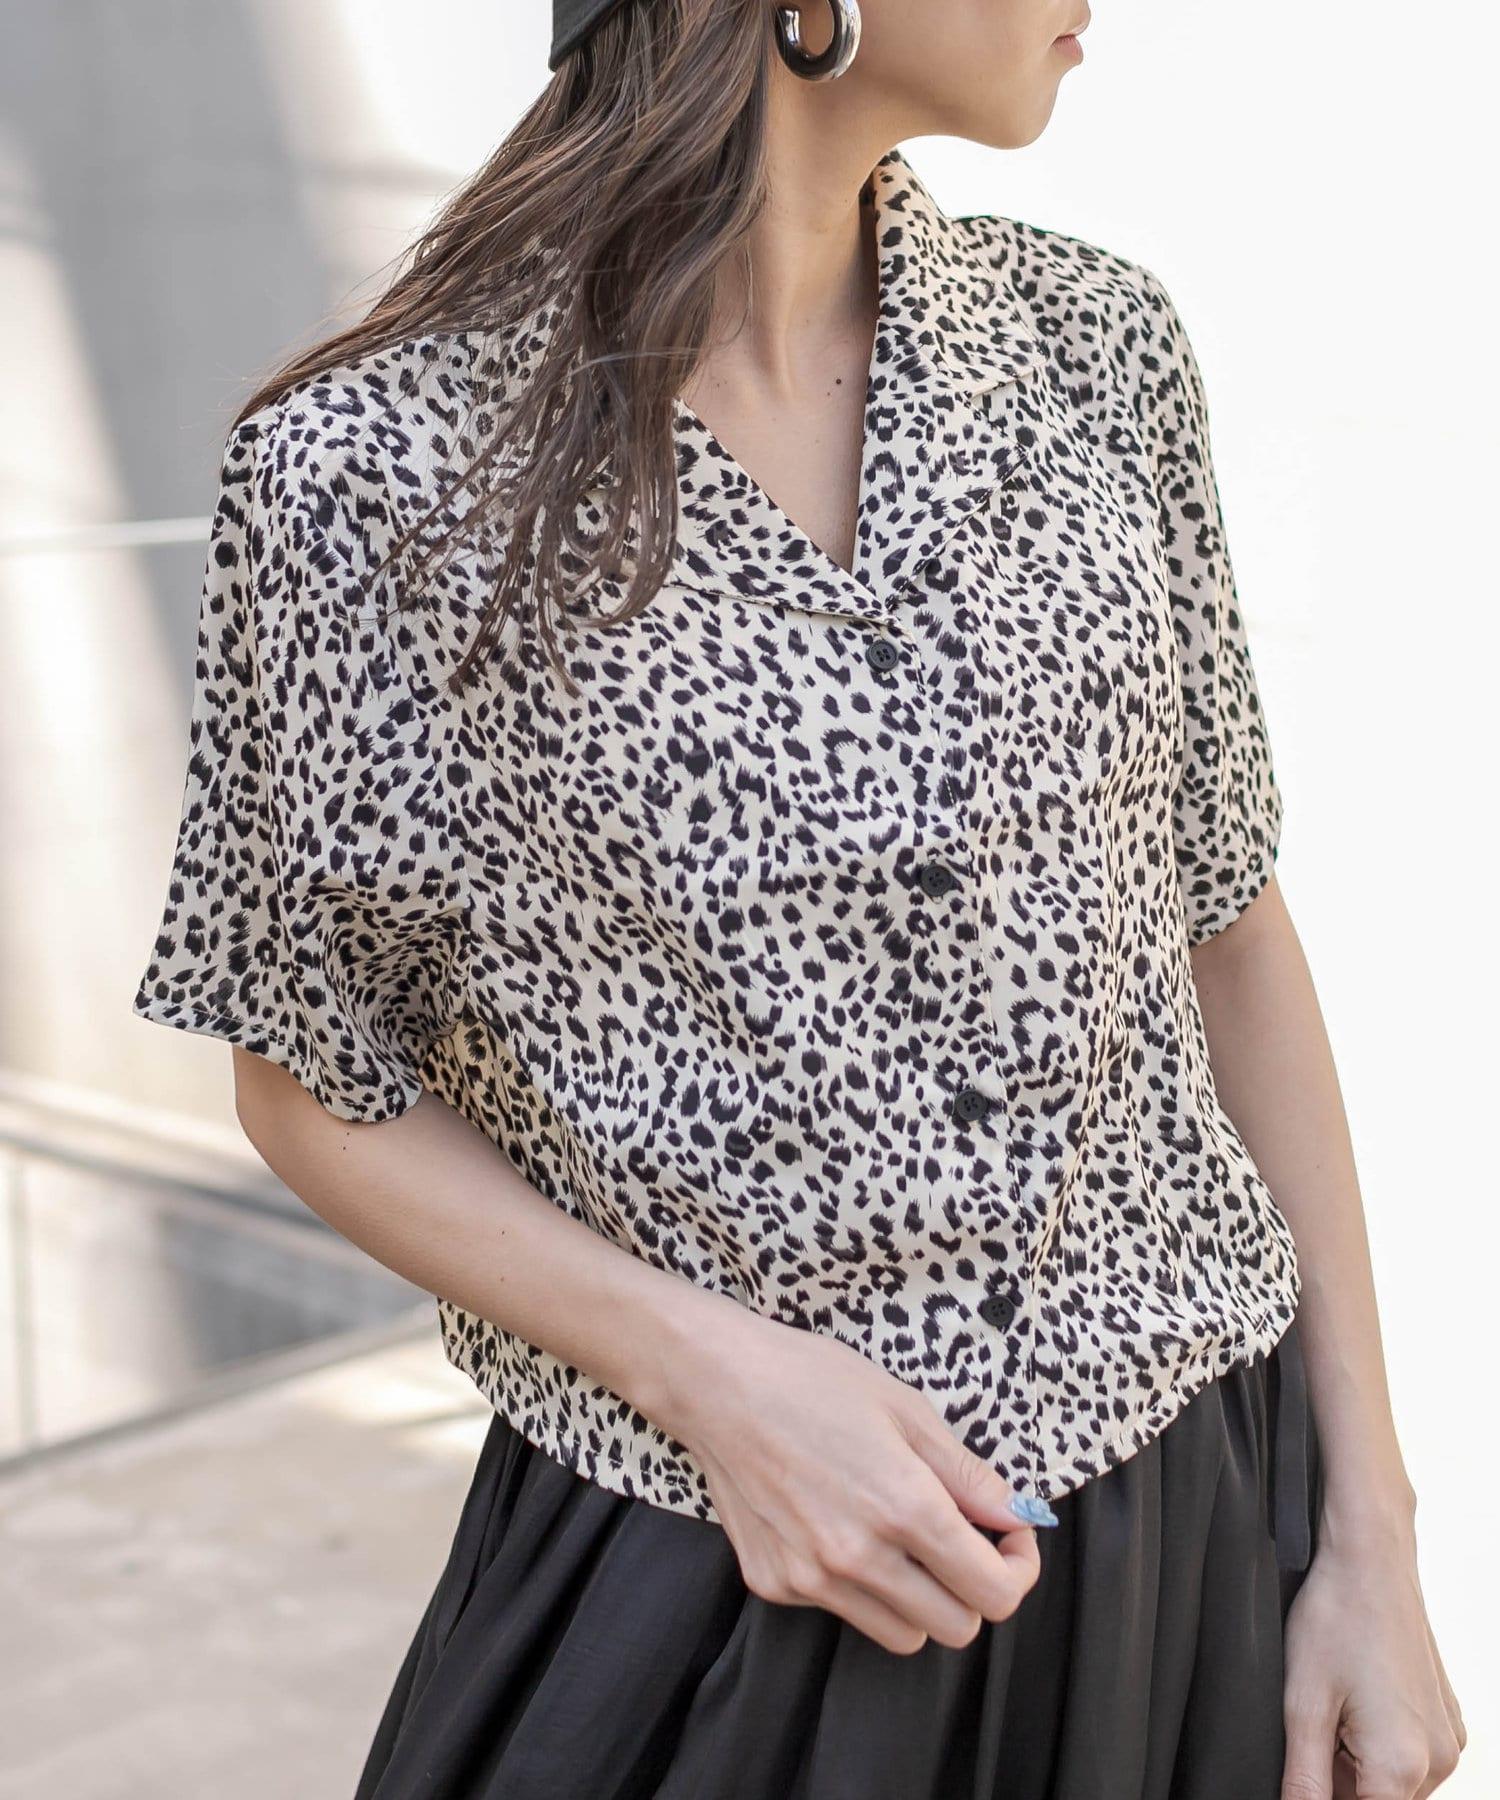 RASVOA(ラスボア) オープンカラーショートシャツ